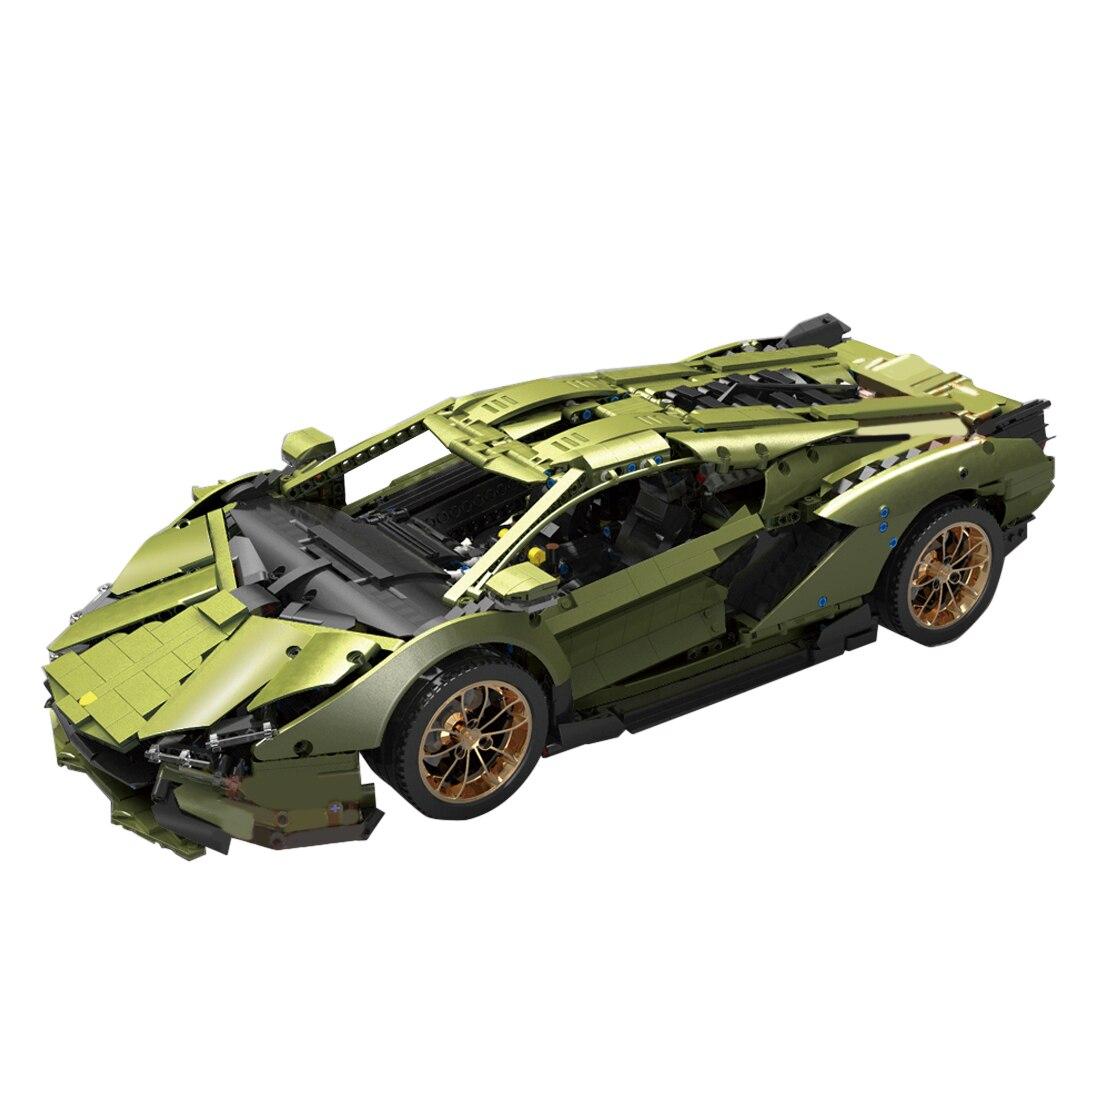 3758Pcs Small Particle Static Version 1:8 Sports Car DIY MOC Building Block Toy Kit - Type 13057